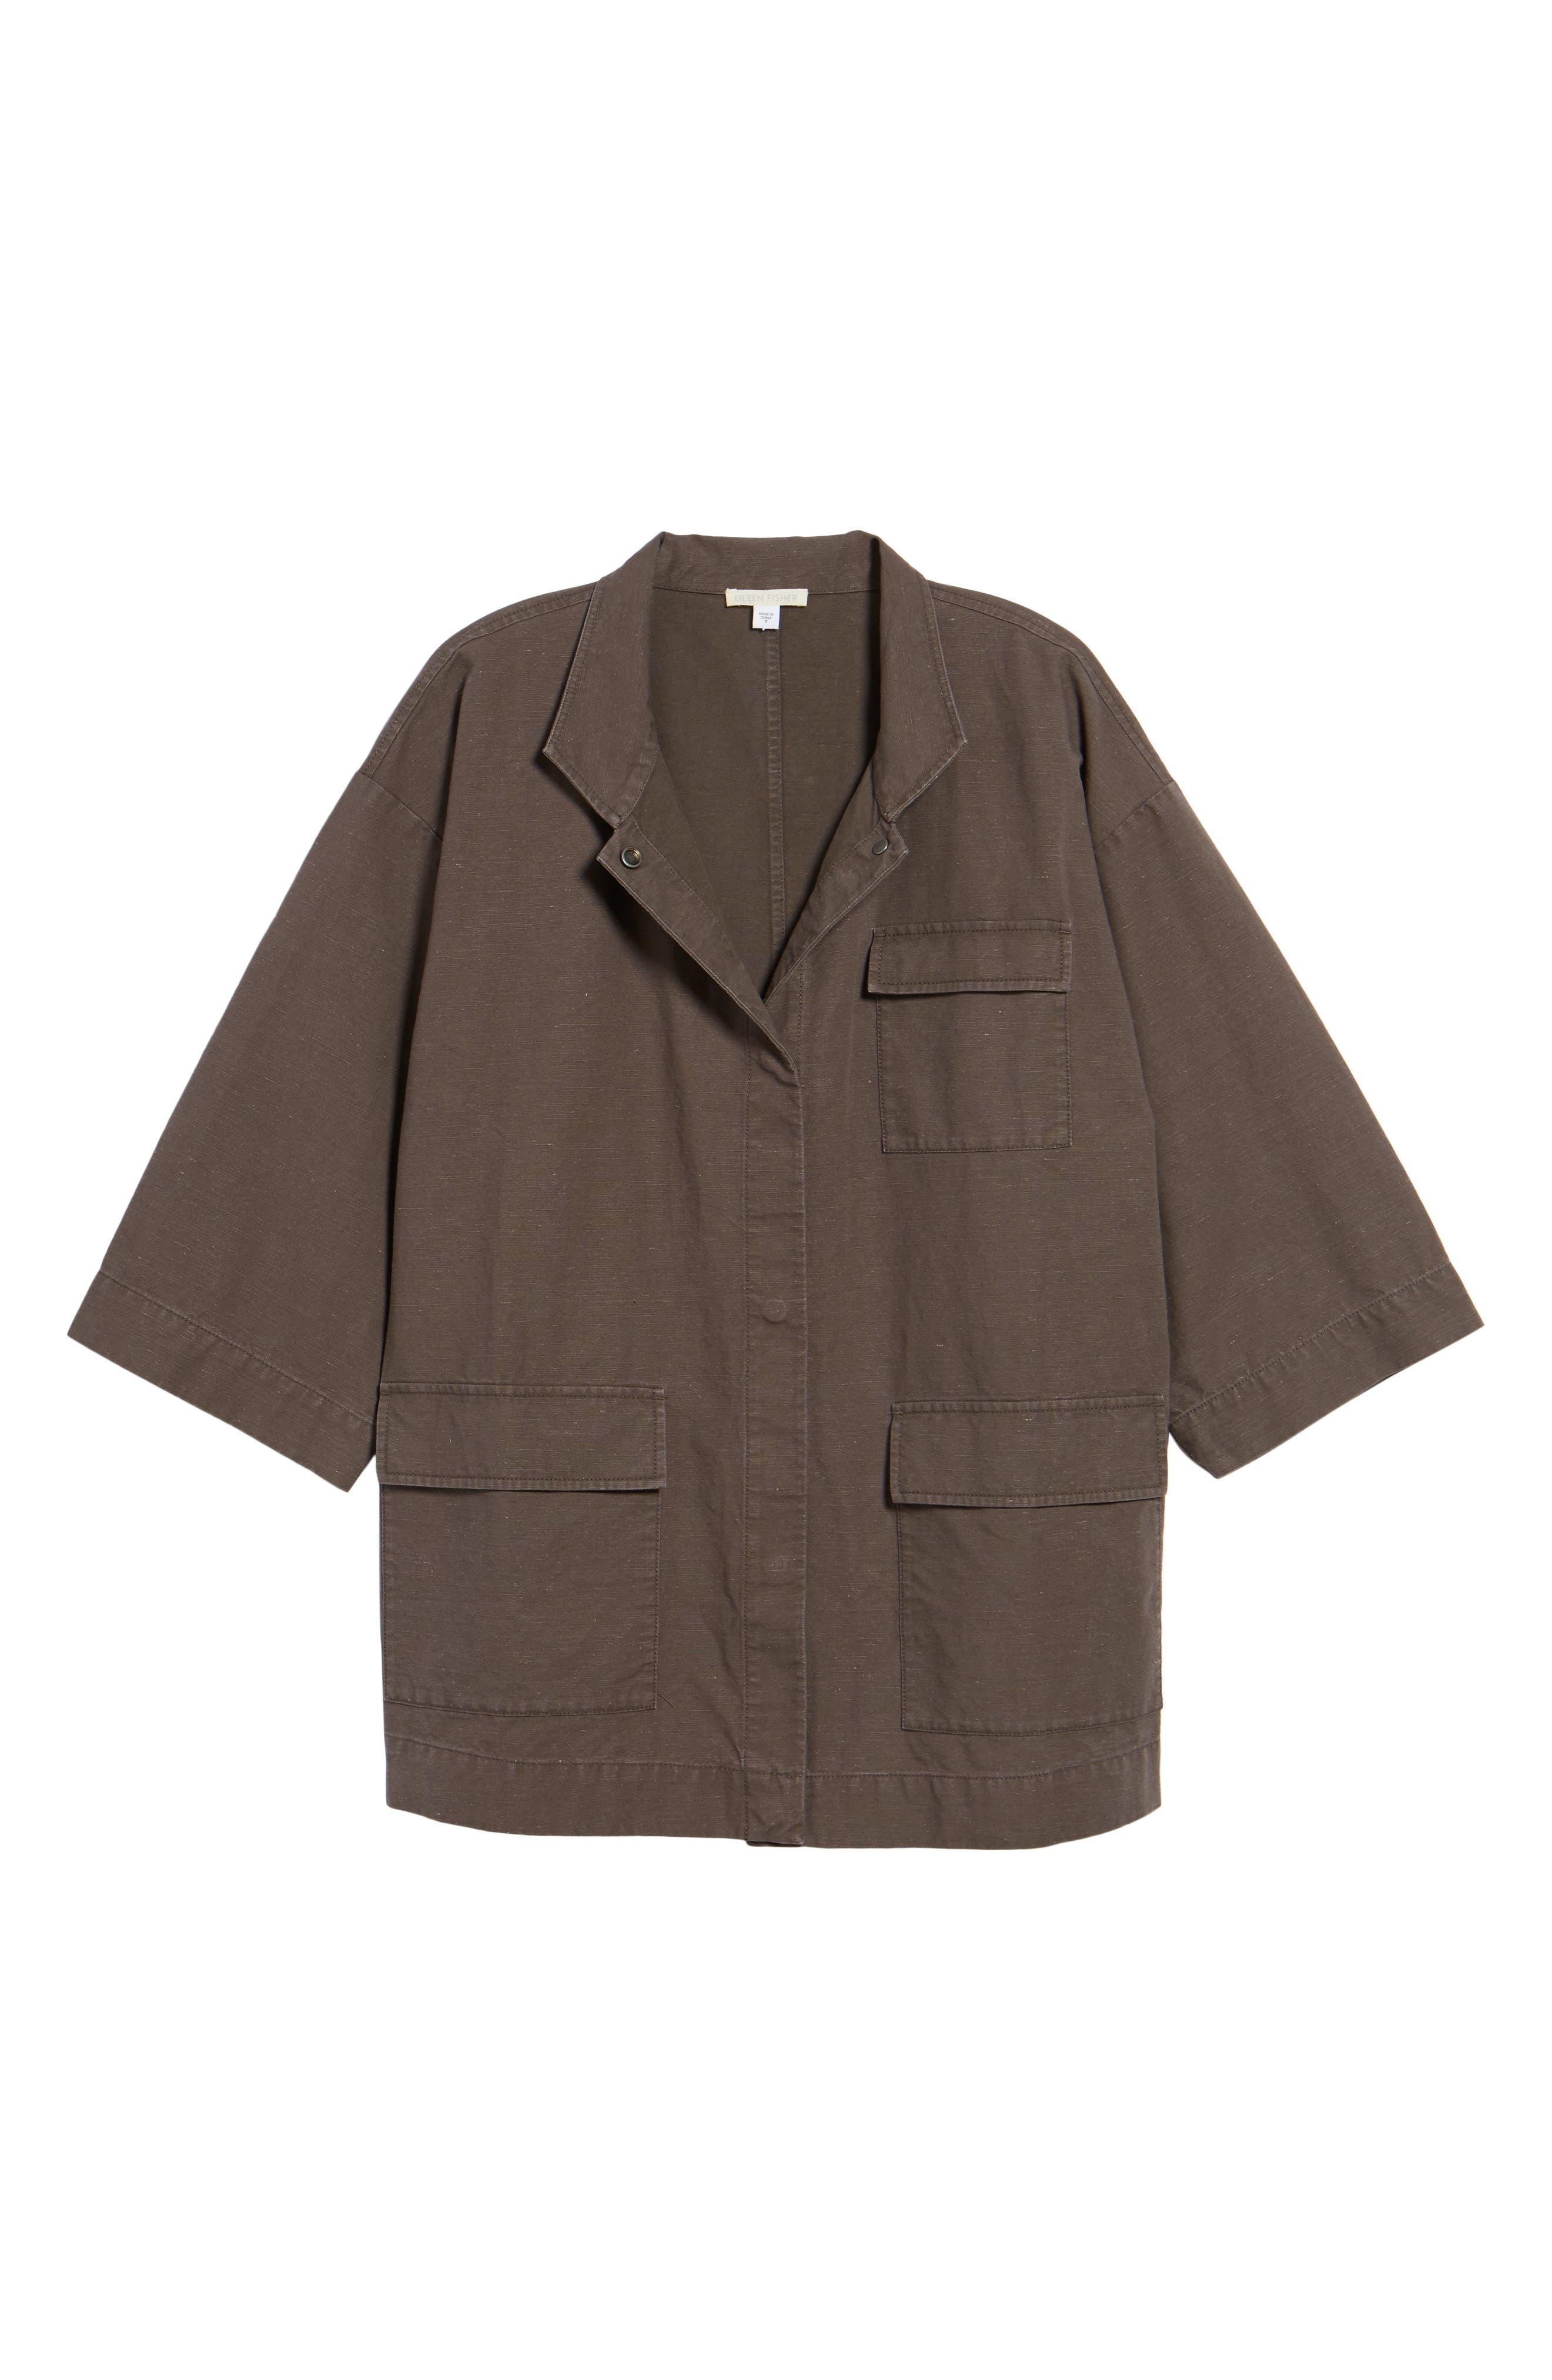 Organic Cotton & Hemp Jacket,                             Alternate thumbnail 5, color,                             024